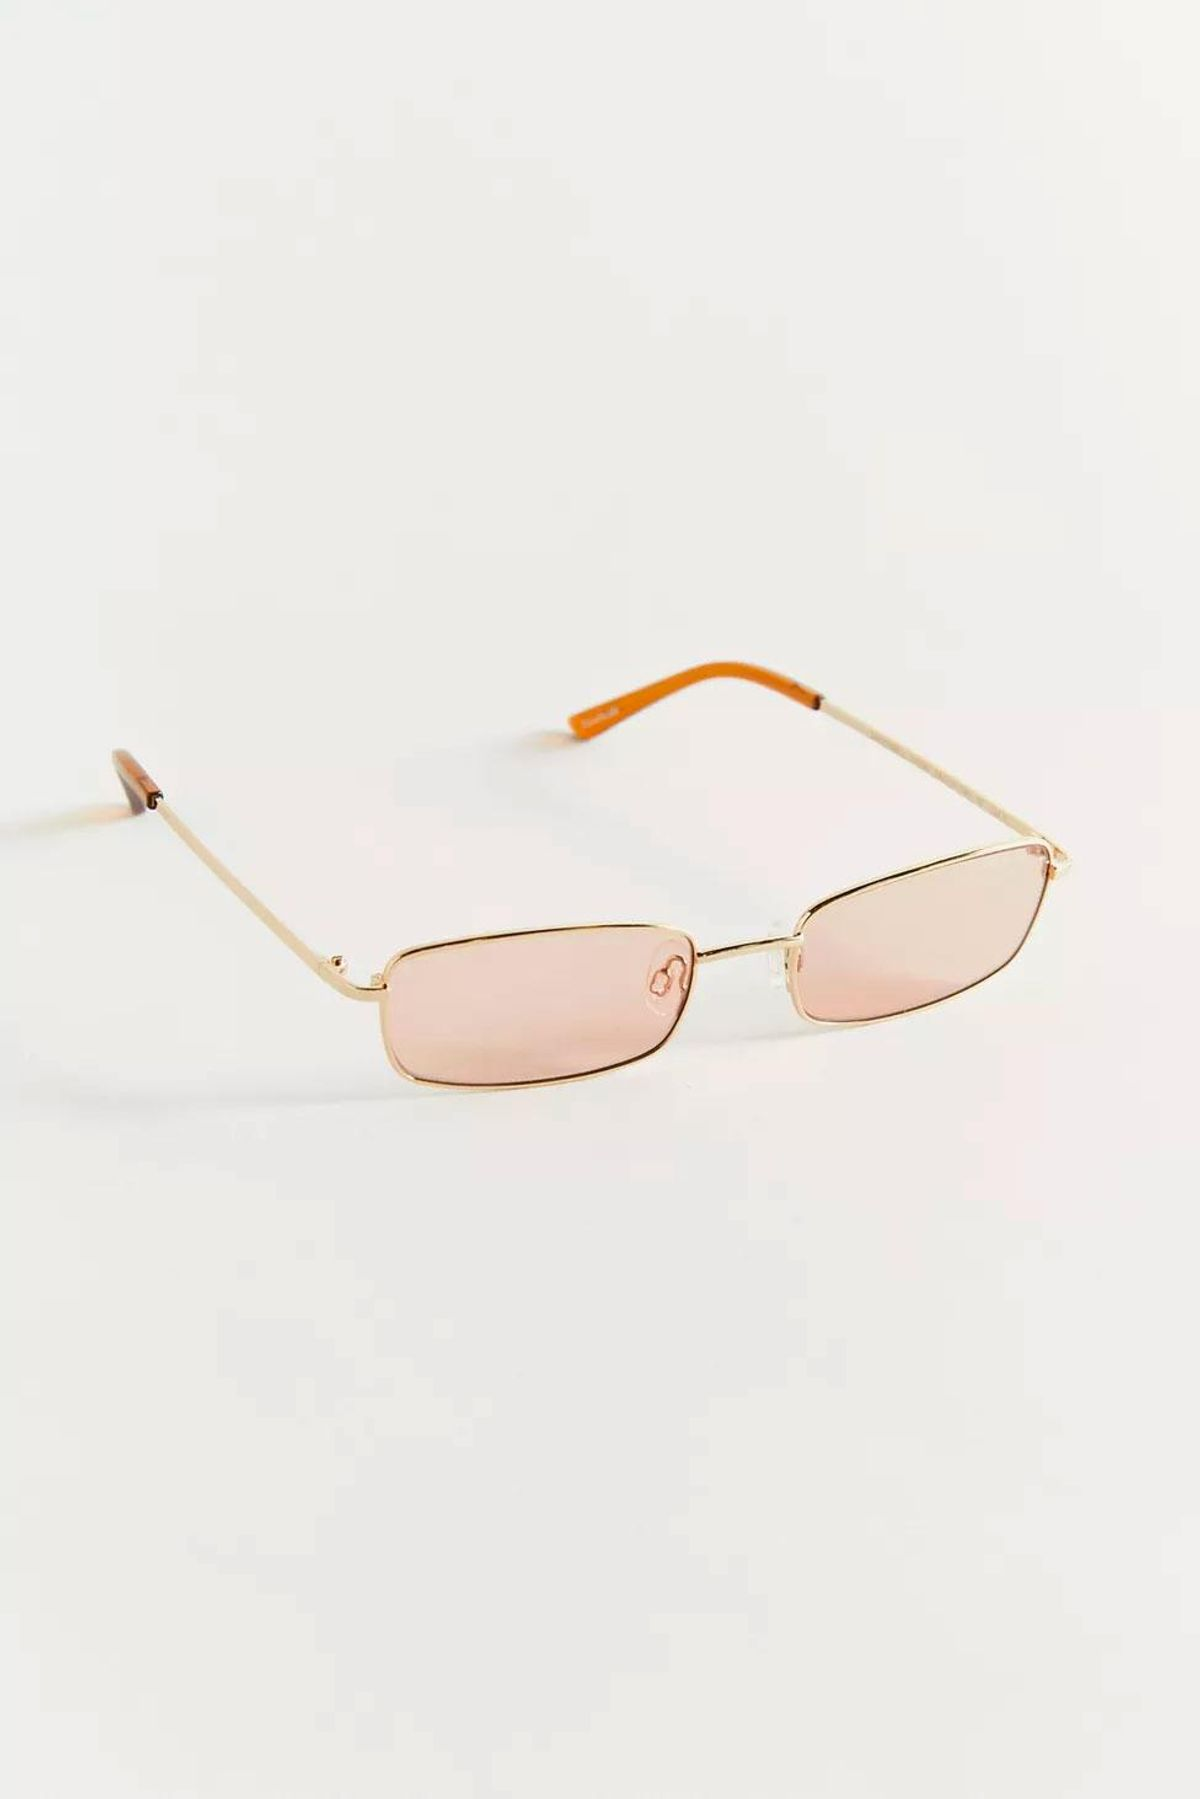 dmy  by dmy olsen sunglasses